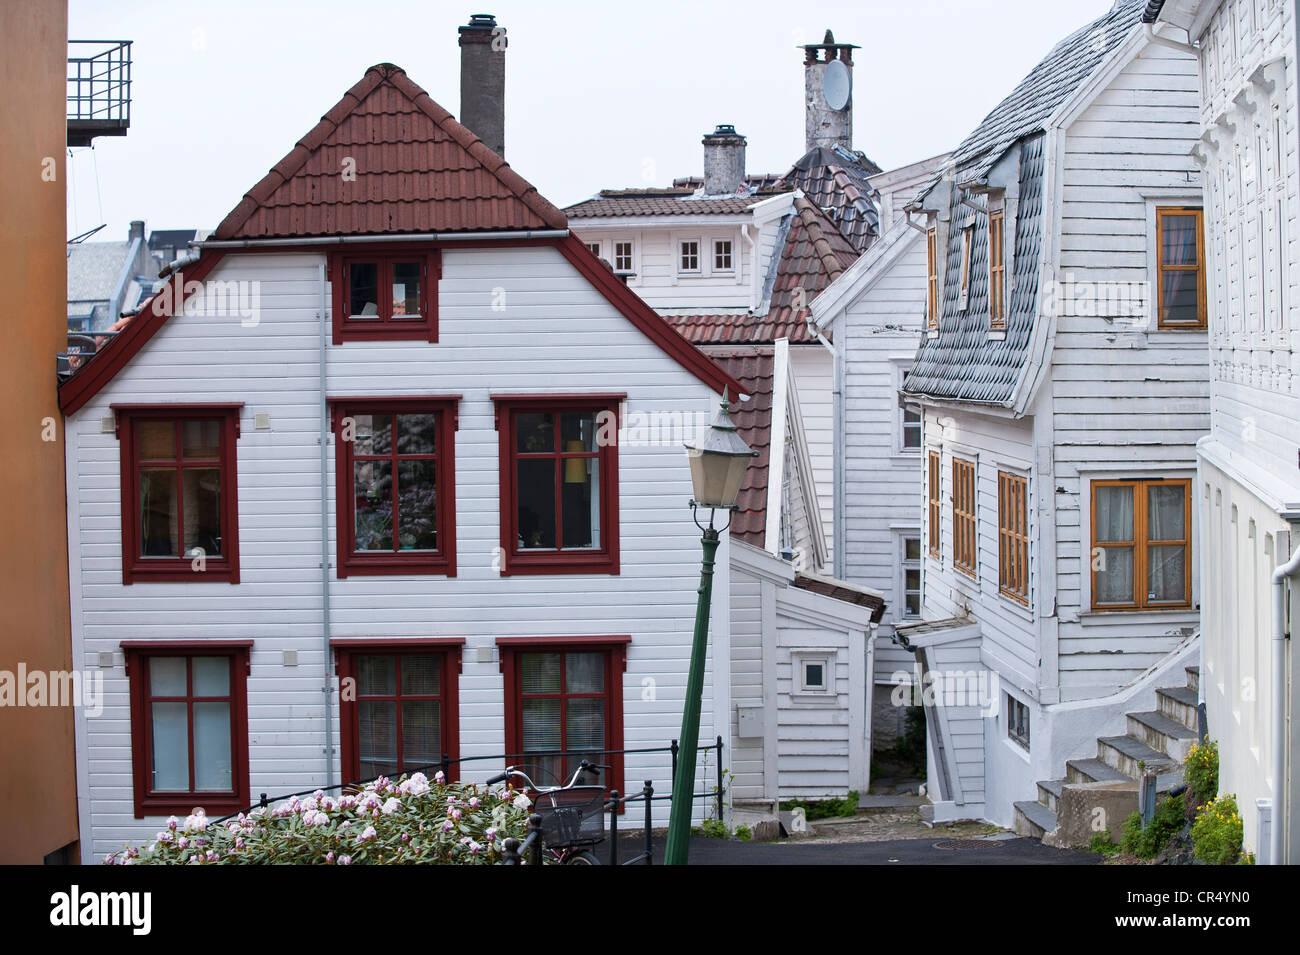 Lille Oevregaten Hordaland, Bergen, Noruega, Escandinavia, Europa del Norte, PublicGround Imagen De Stock